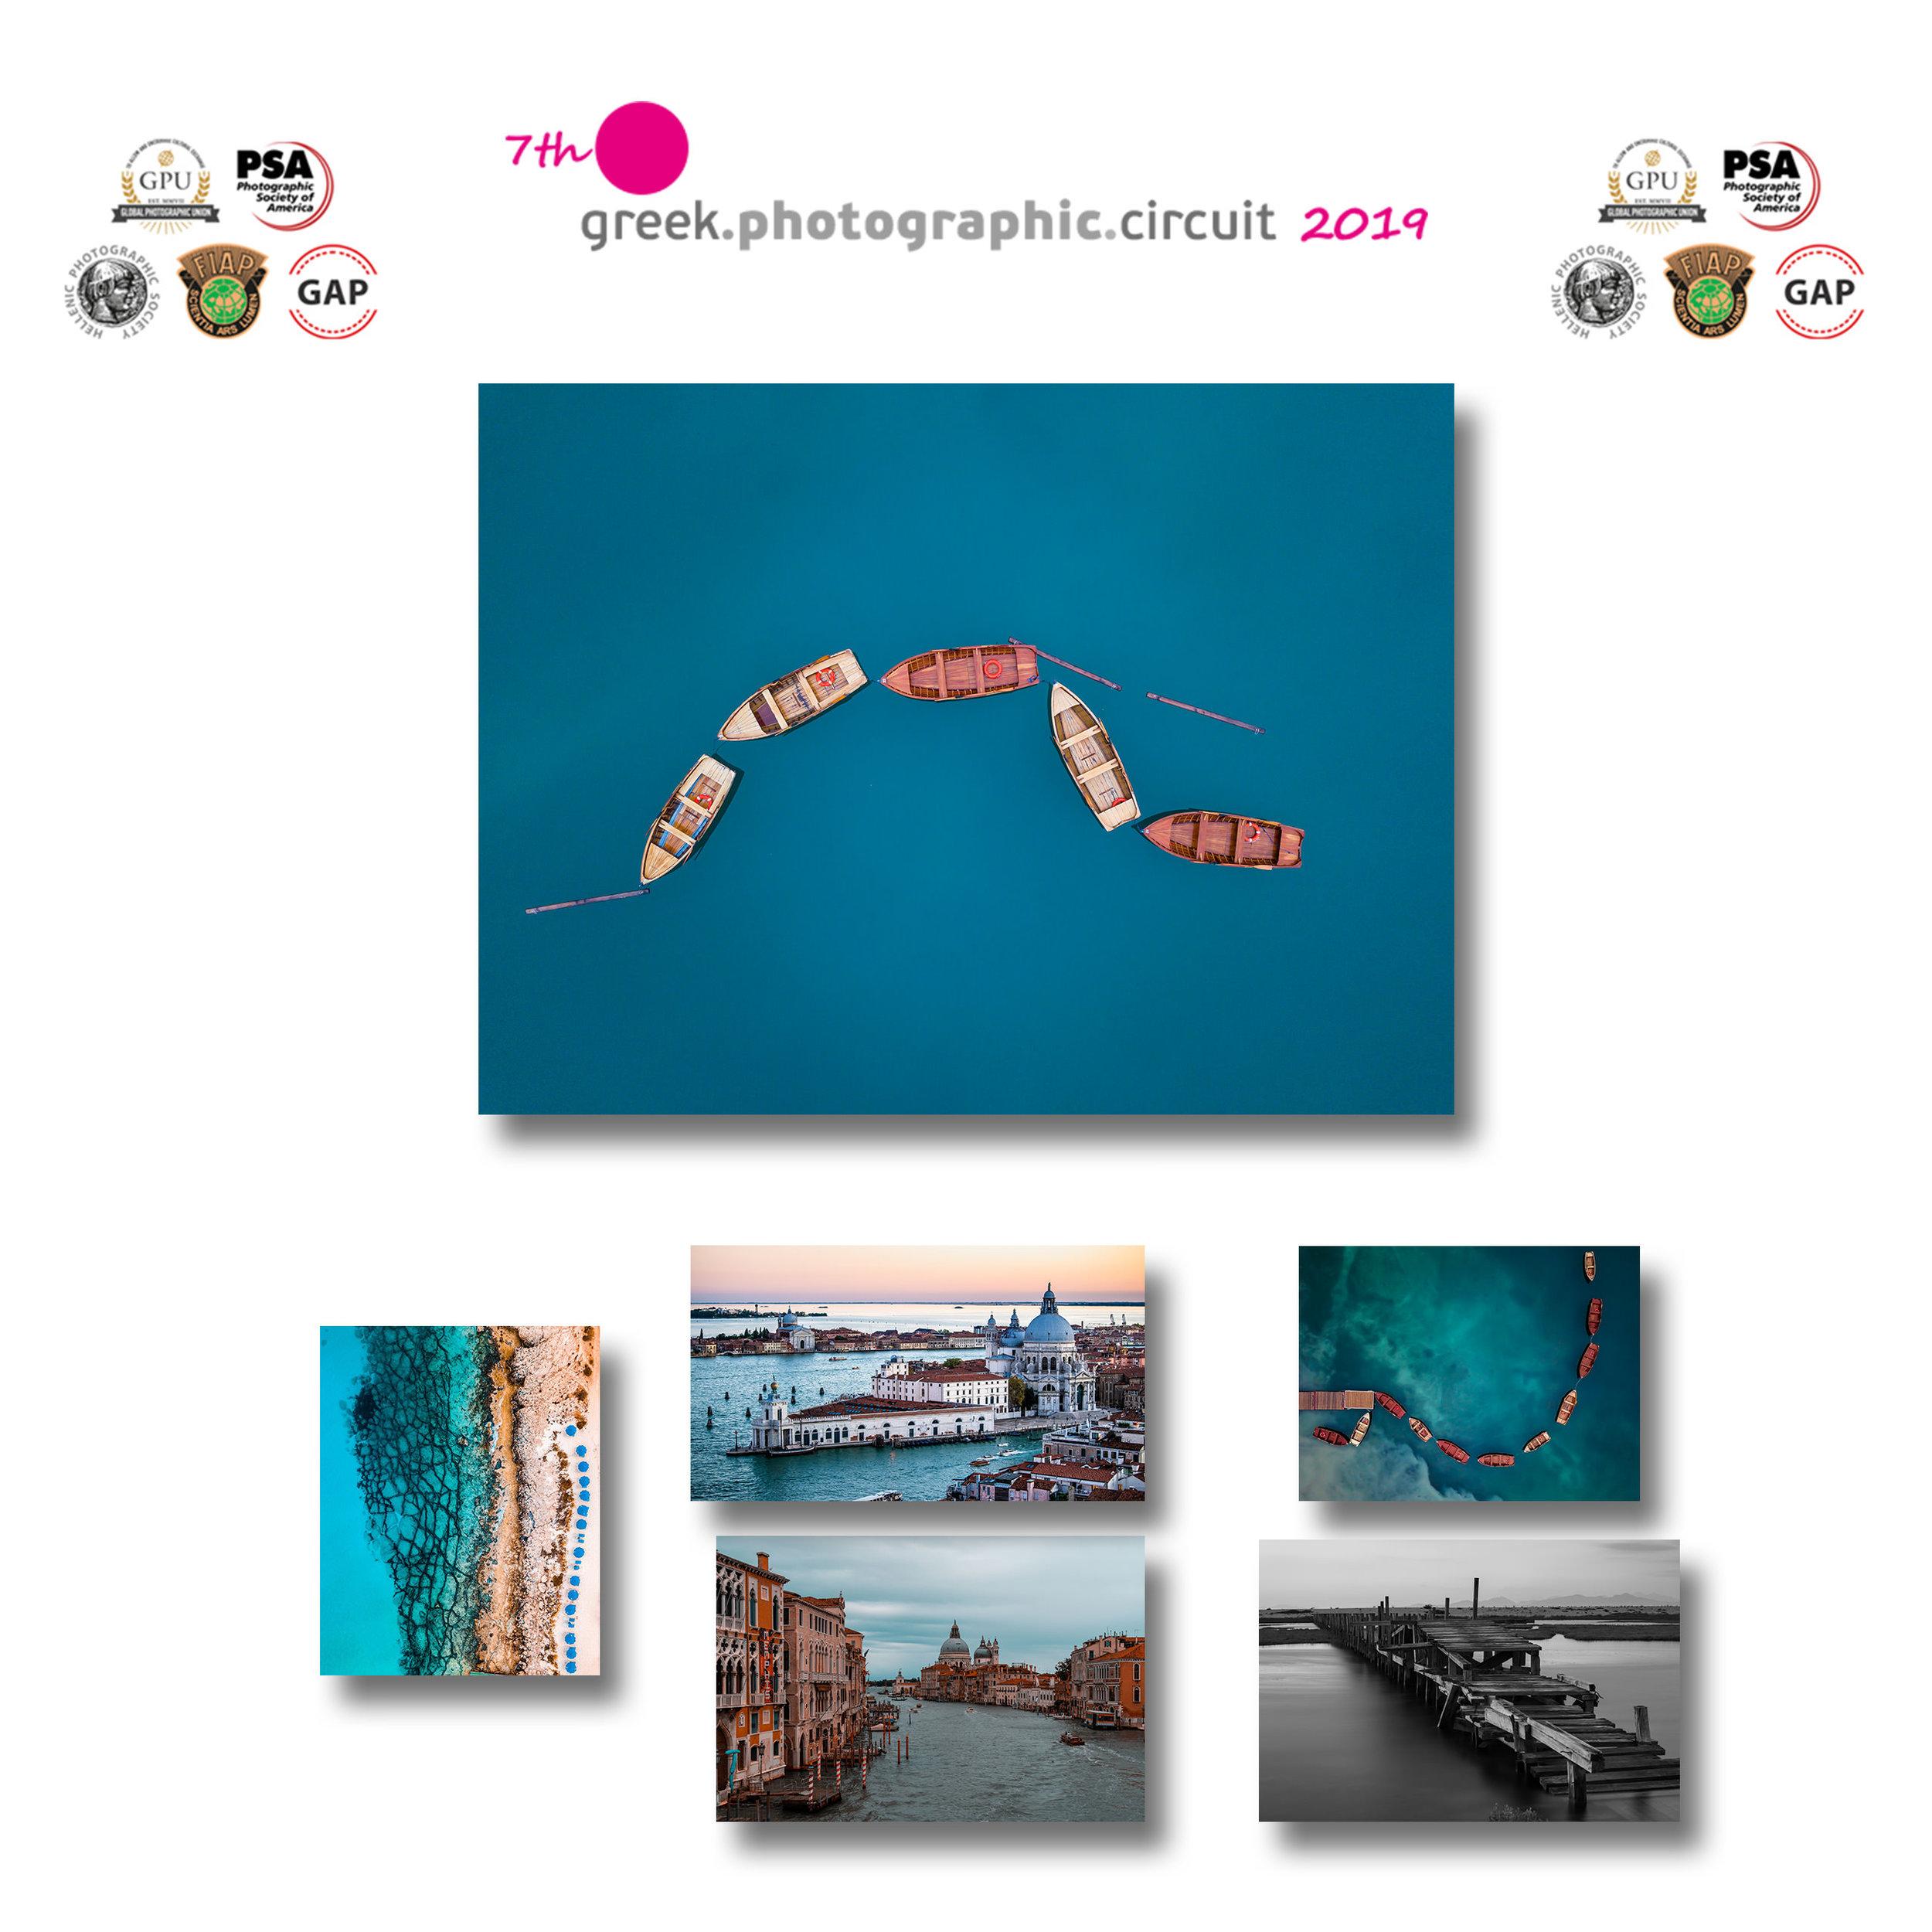 GPU gold Award - Greek Photographic Circuit 2019